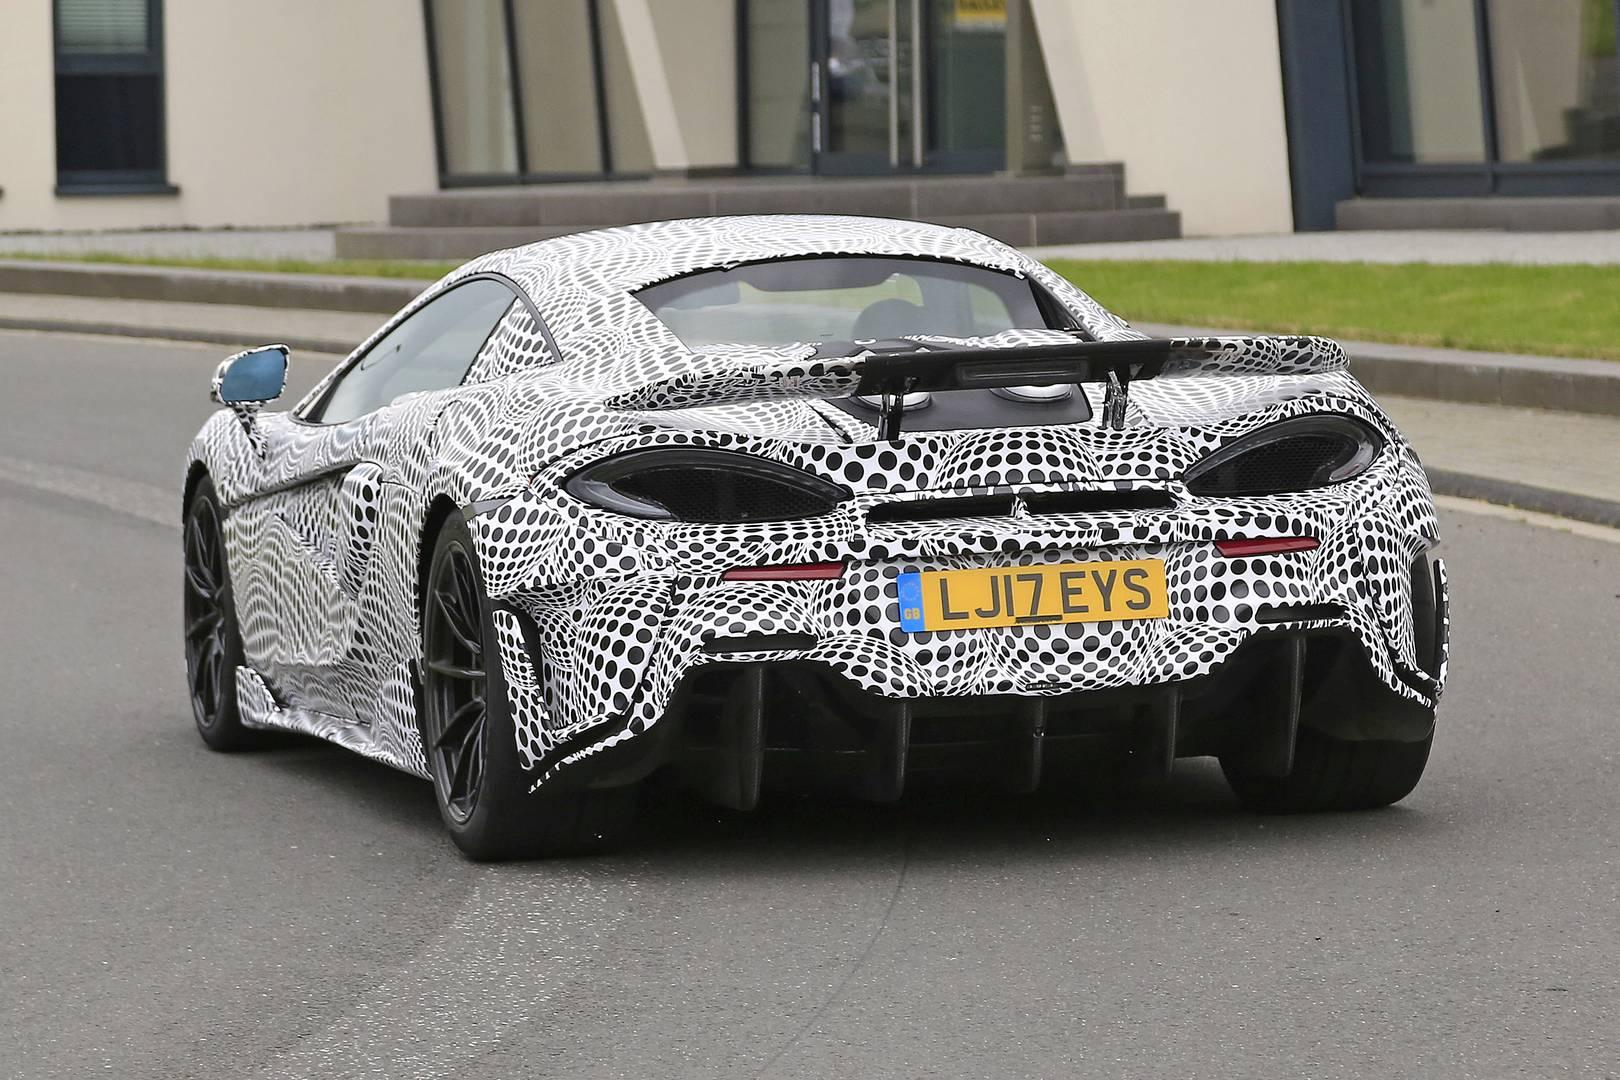 28 июня - официальная дата дебюта McLaren 600 LT.